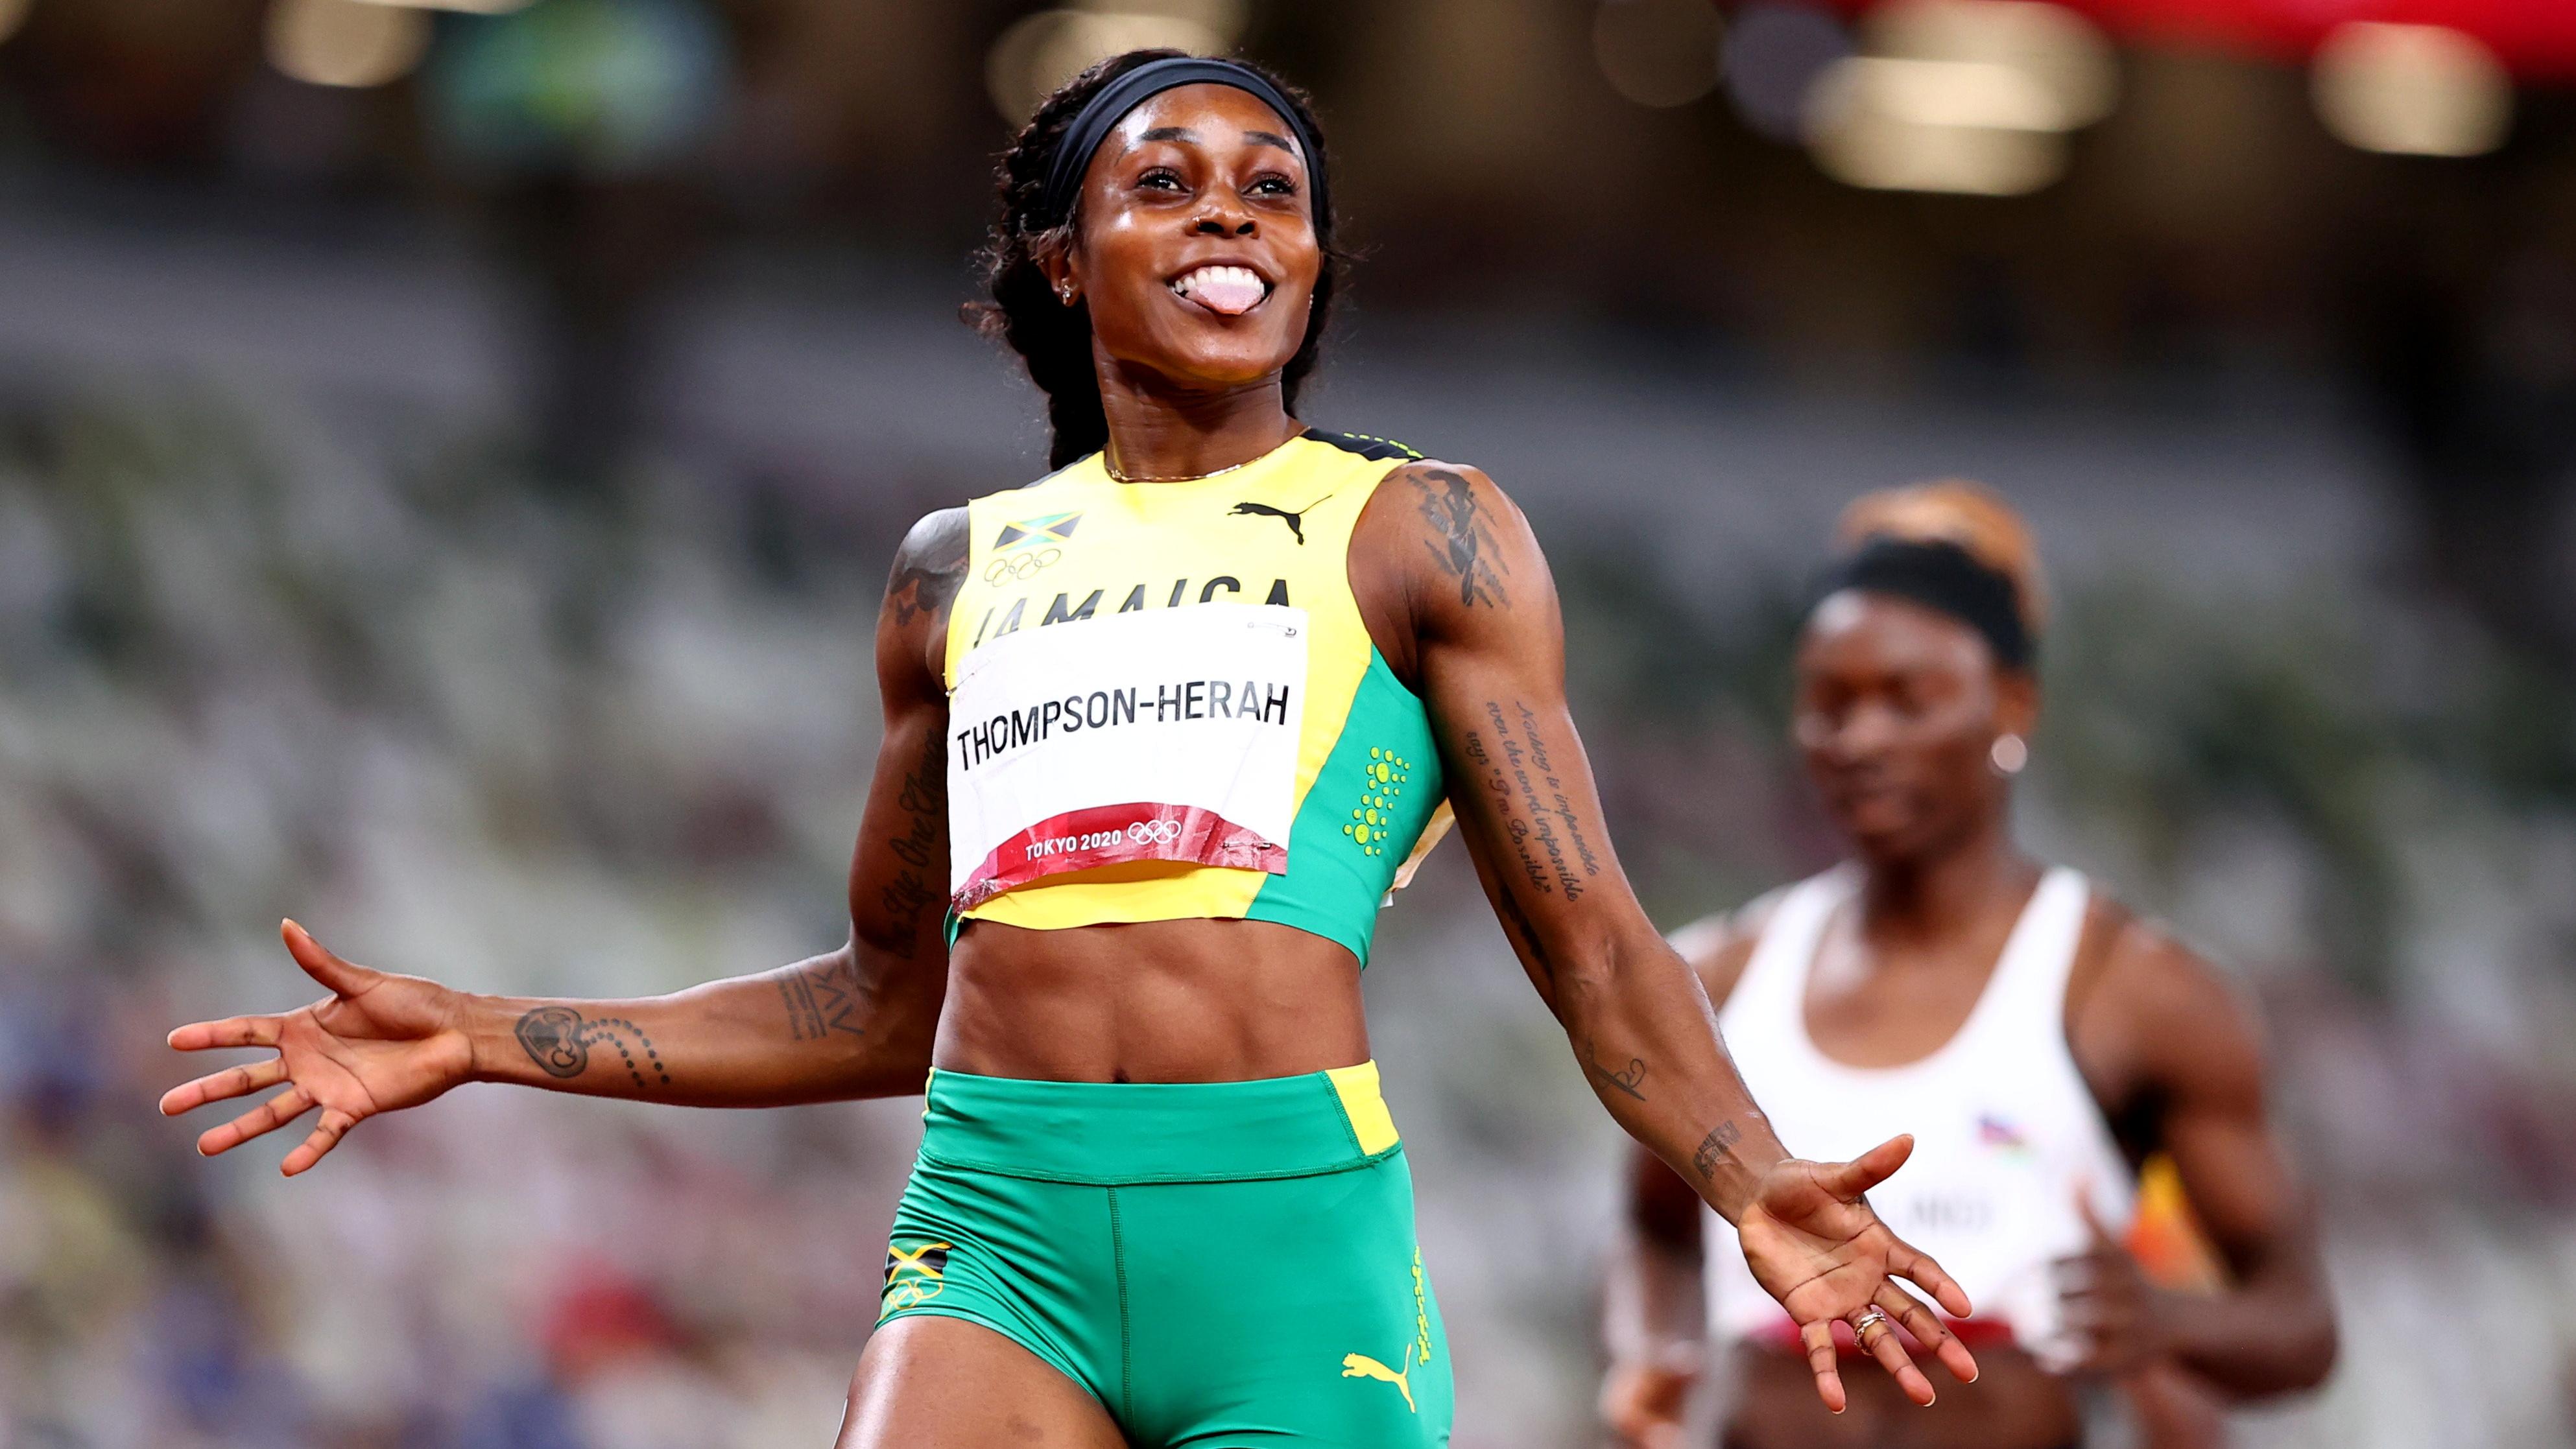 Tokyo 2020 Olympics - Athletics - Women's 200m - Final - Olympic Stadium, Tokyo, Japan - August 3, 2021. Elaine Thompson-Herah of Jamaica celebrates winning gold REUTERS/Lucy Nicholson